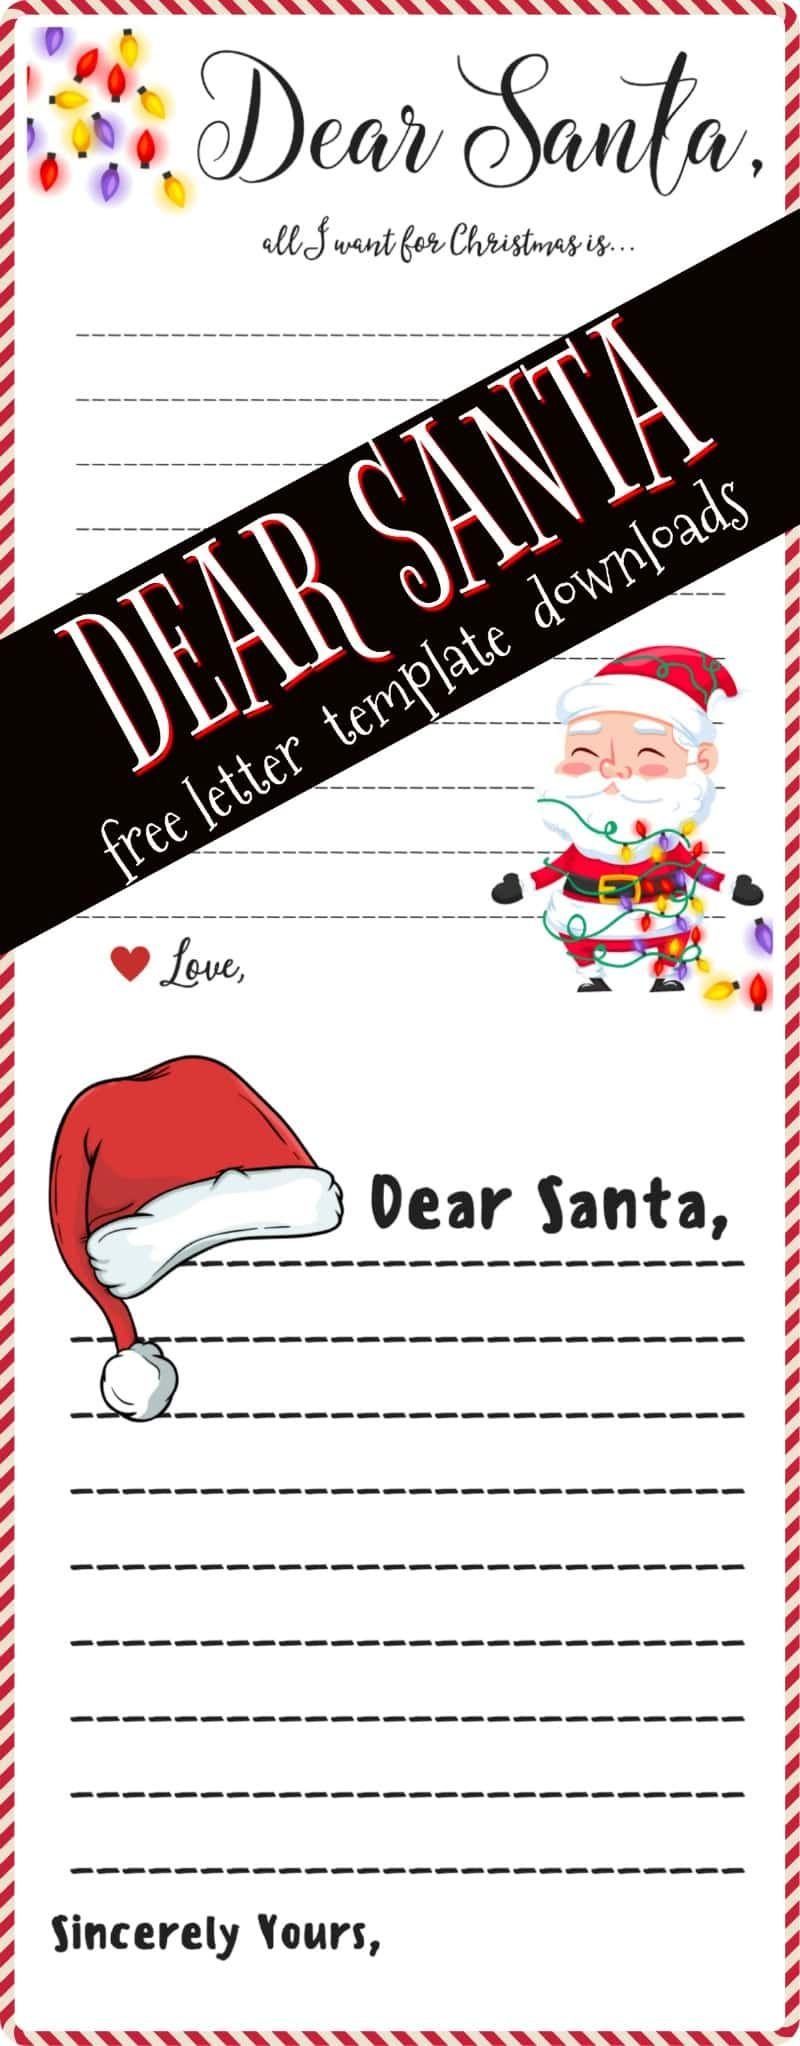 Dear Santa Letter Free Printable Downloads Dear santa